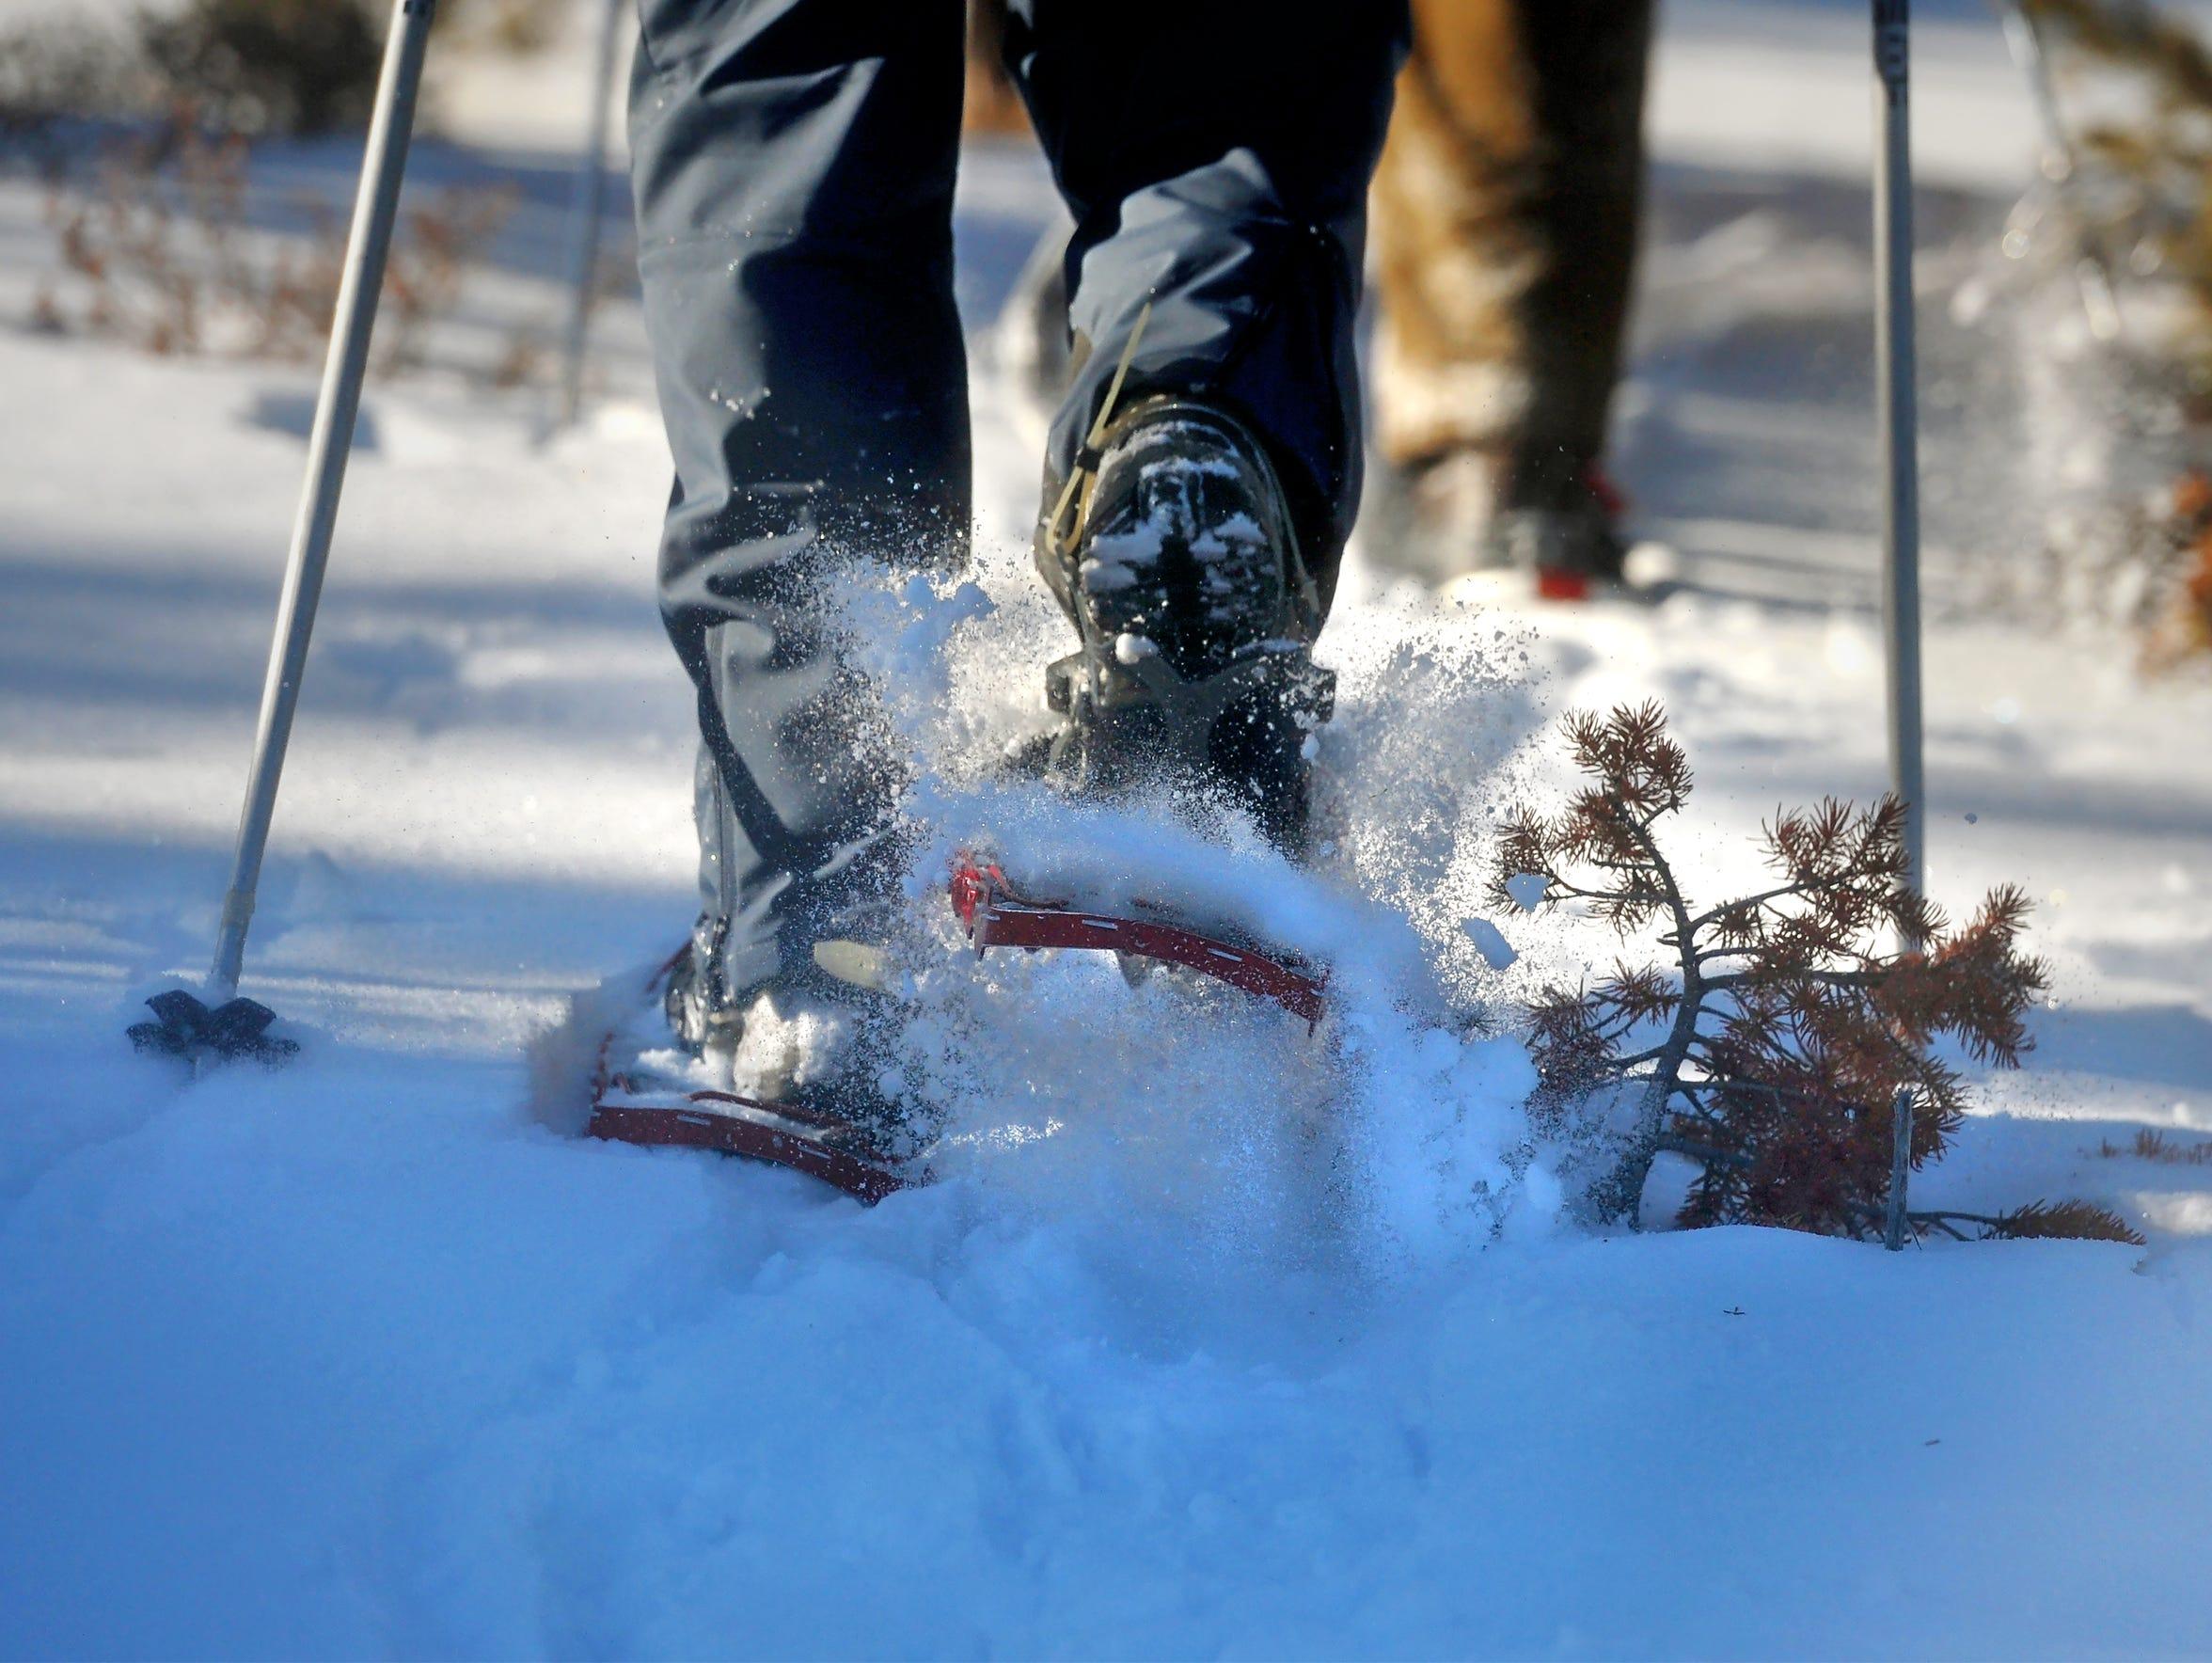 Snowshoeing through the Big Snowy Mountains.